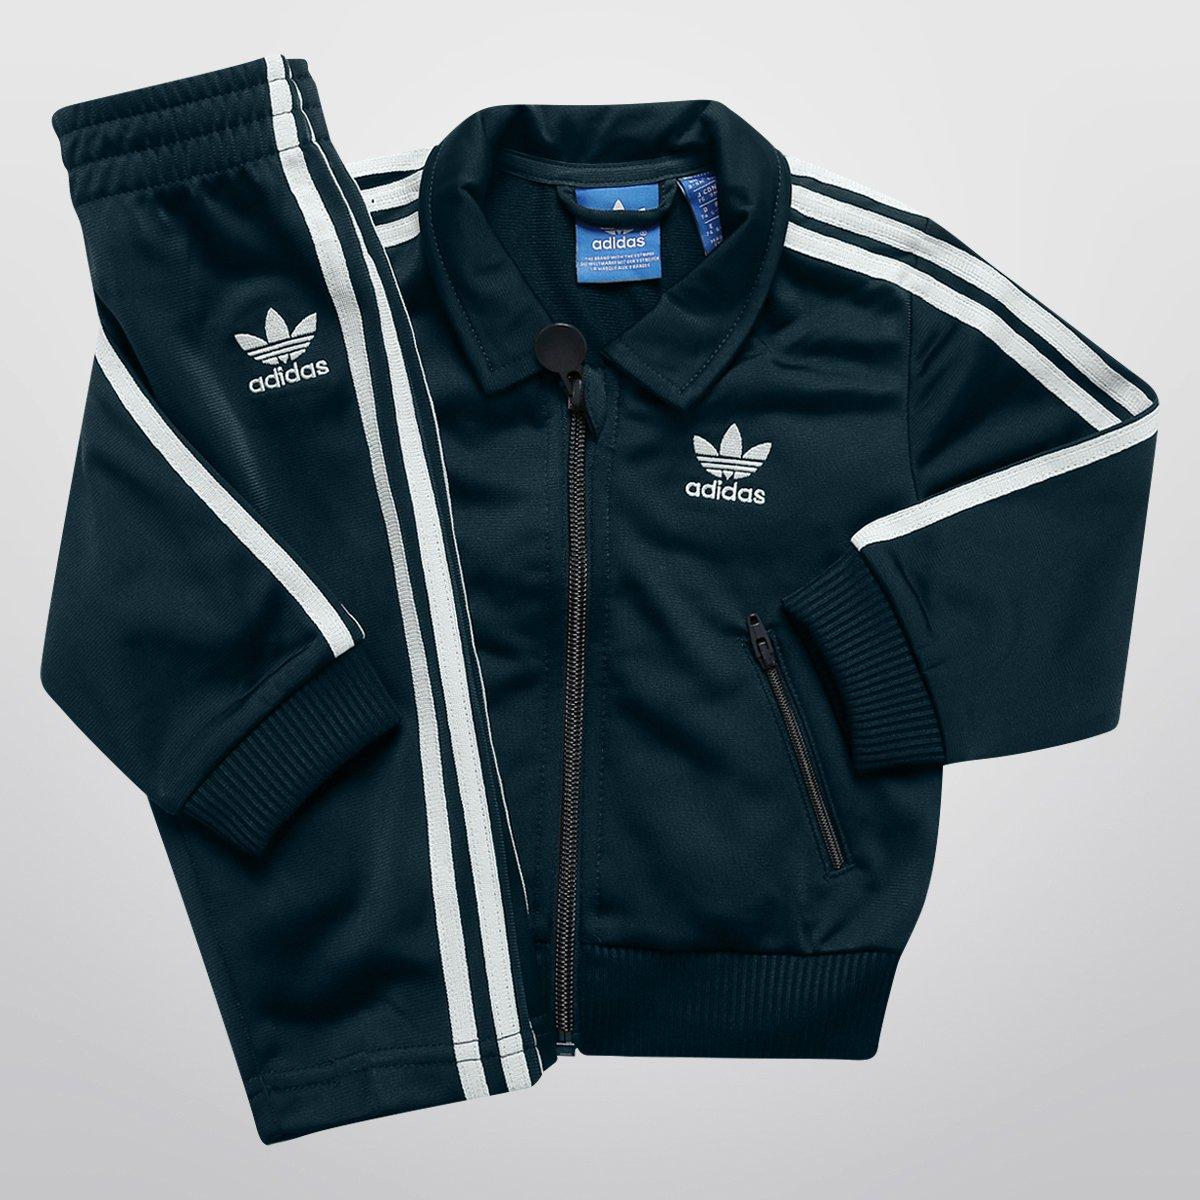 Agasalho Adidas 1 Firebird TS Infantil - Compre Agora  b7509519af0d9